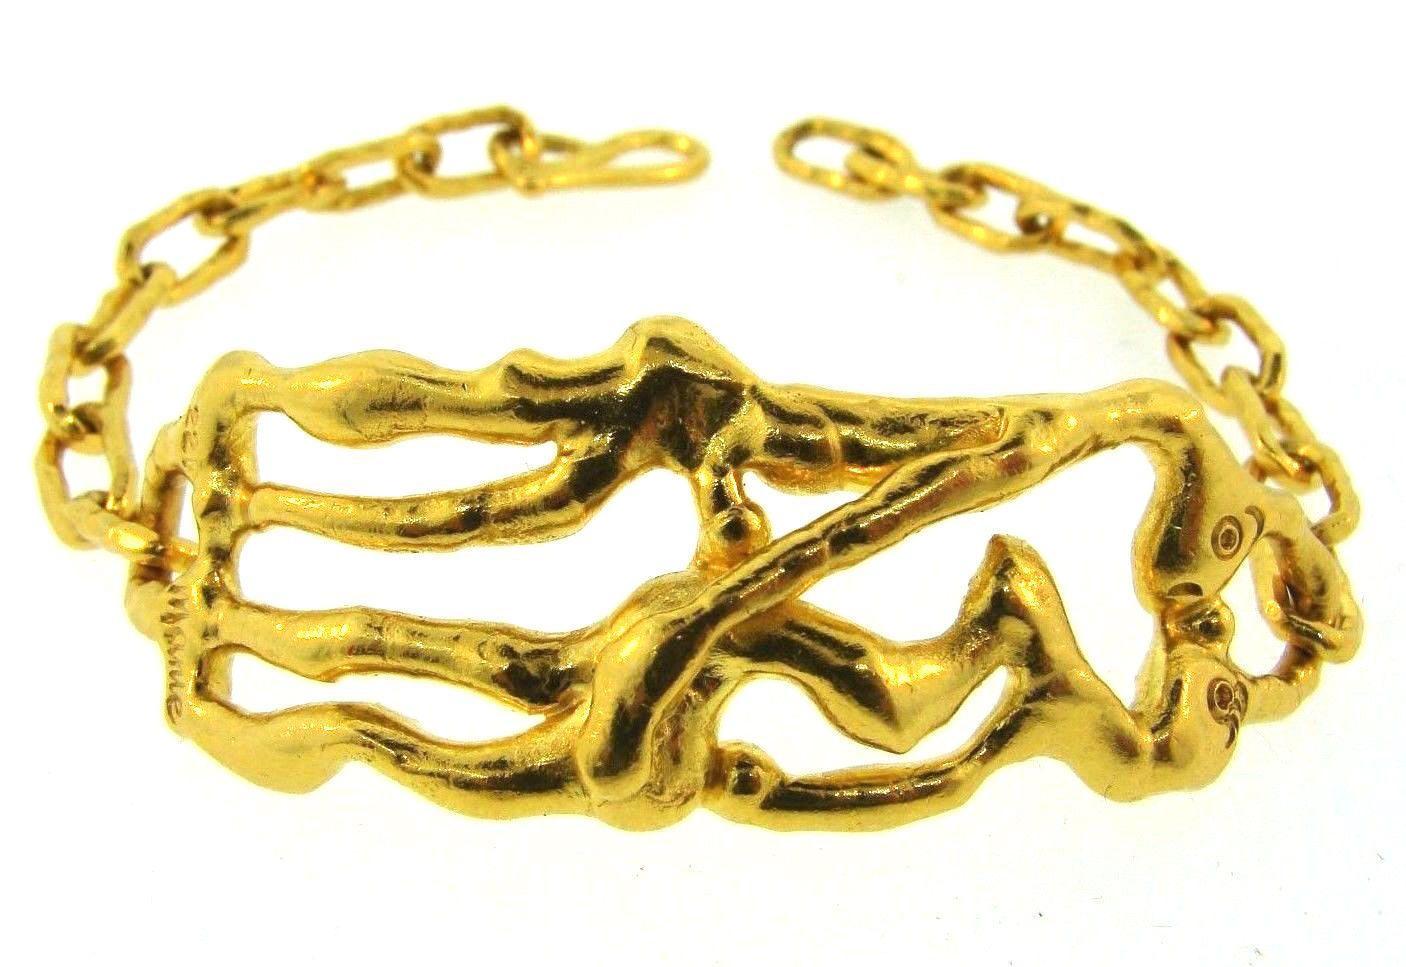 Jean Mahie 22K Yellow Gold Open-Pear Pendant wBaofJJao